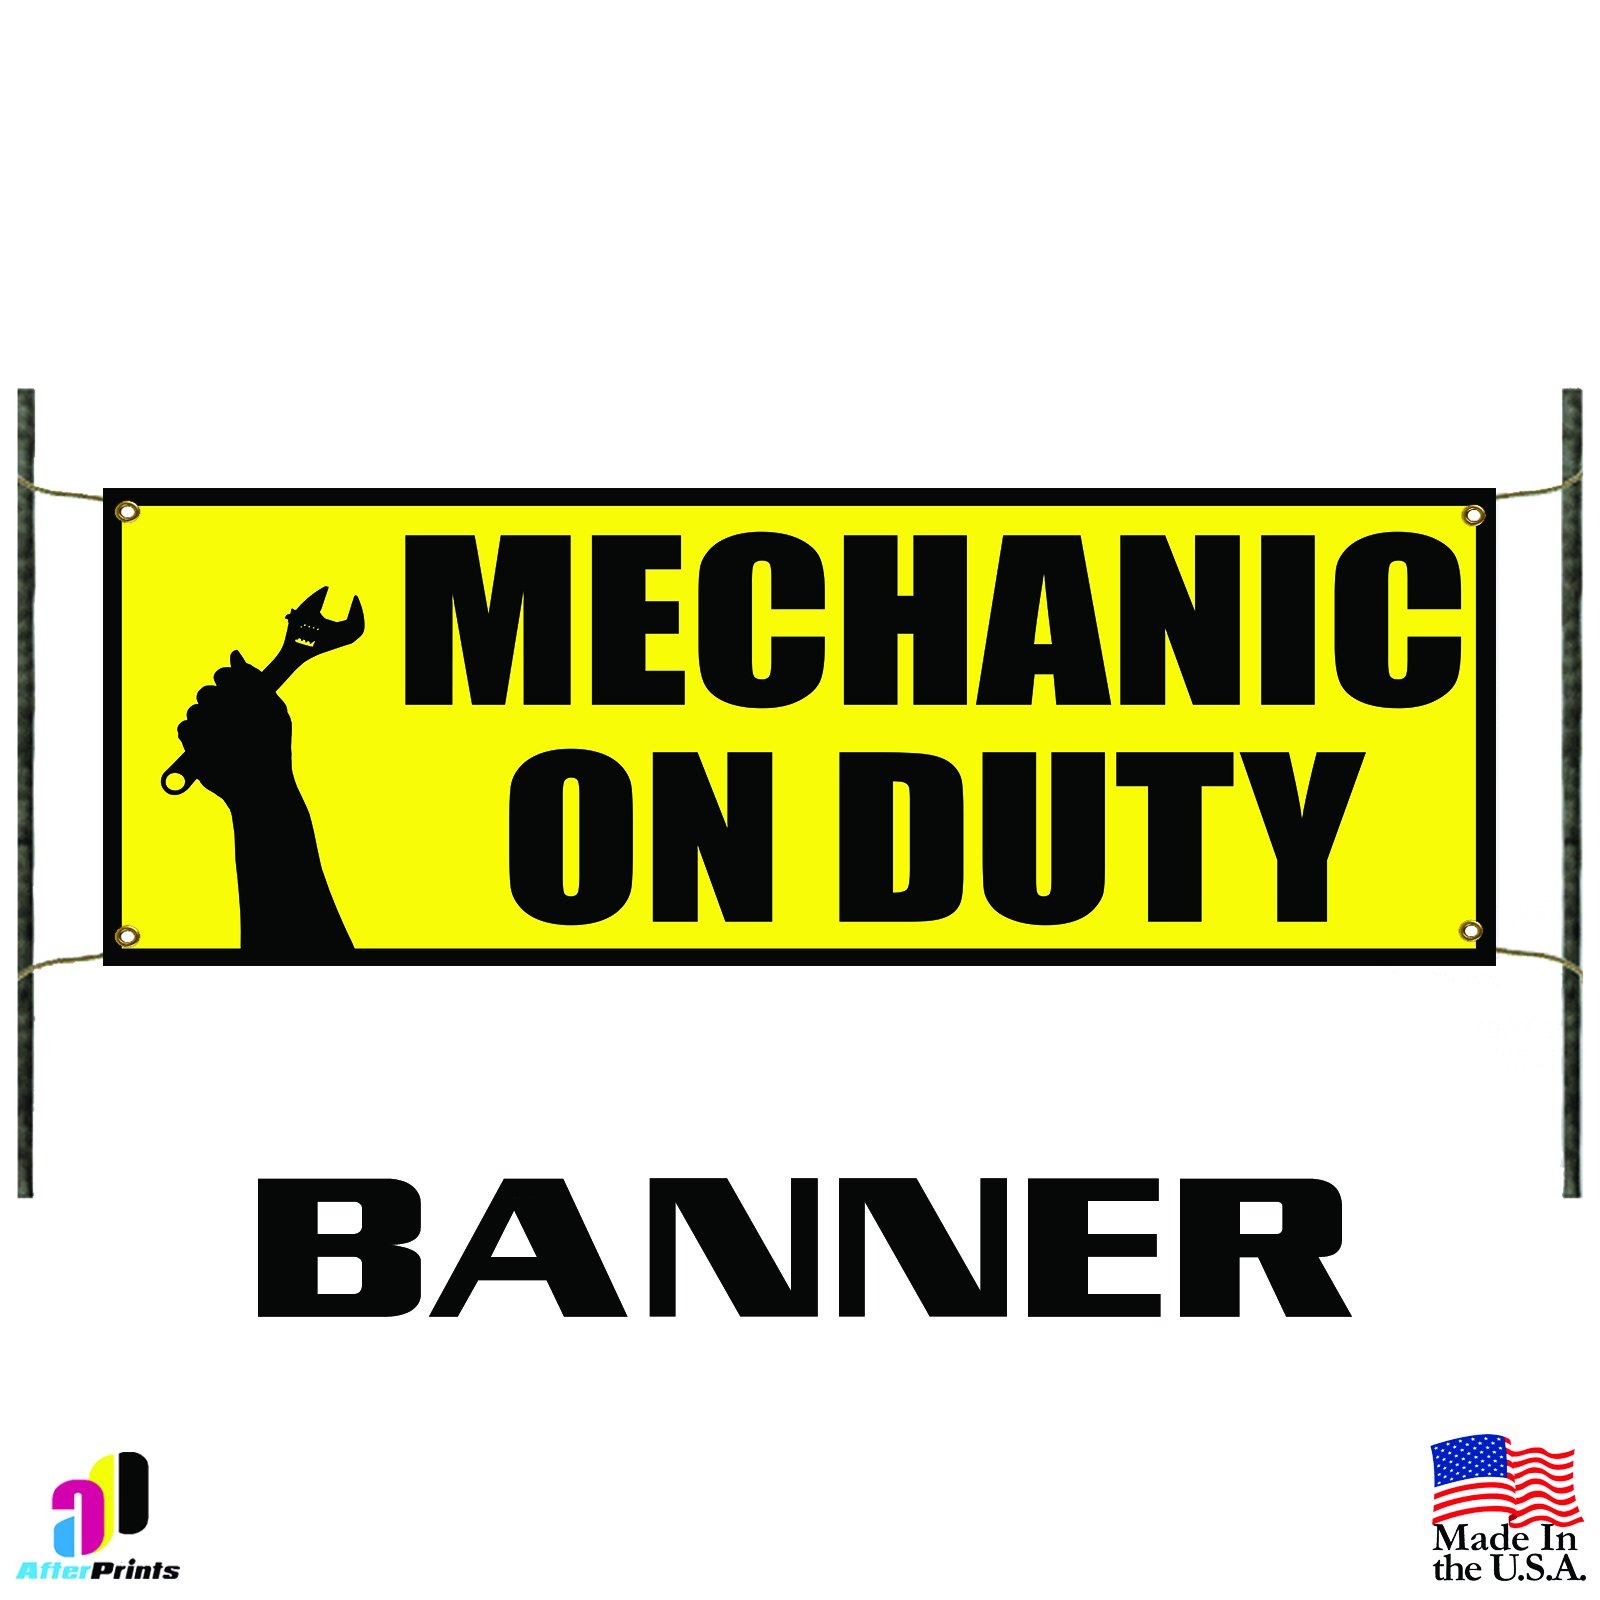 Mechanic On Duty Advertising Vinyl Banner Sign Auto Body Shop Car Repair Tools